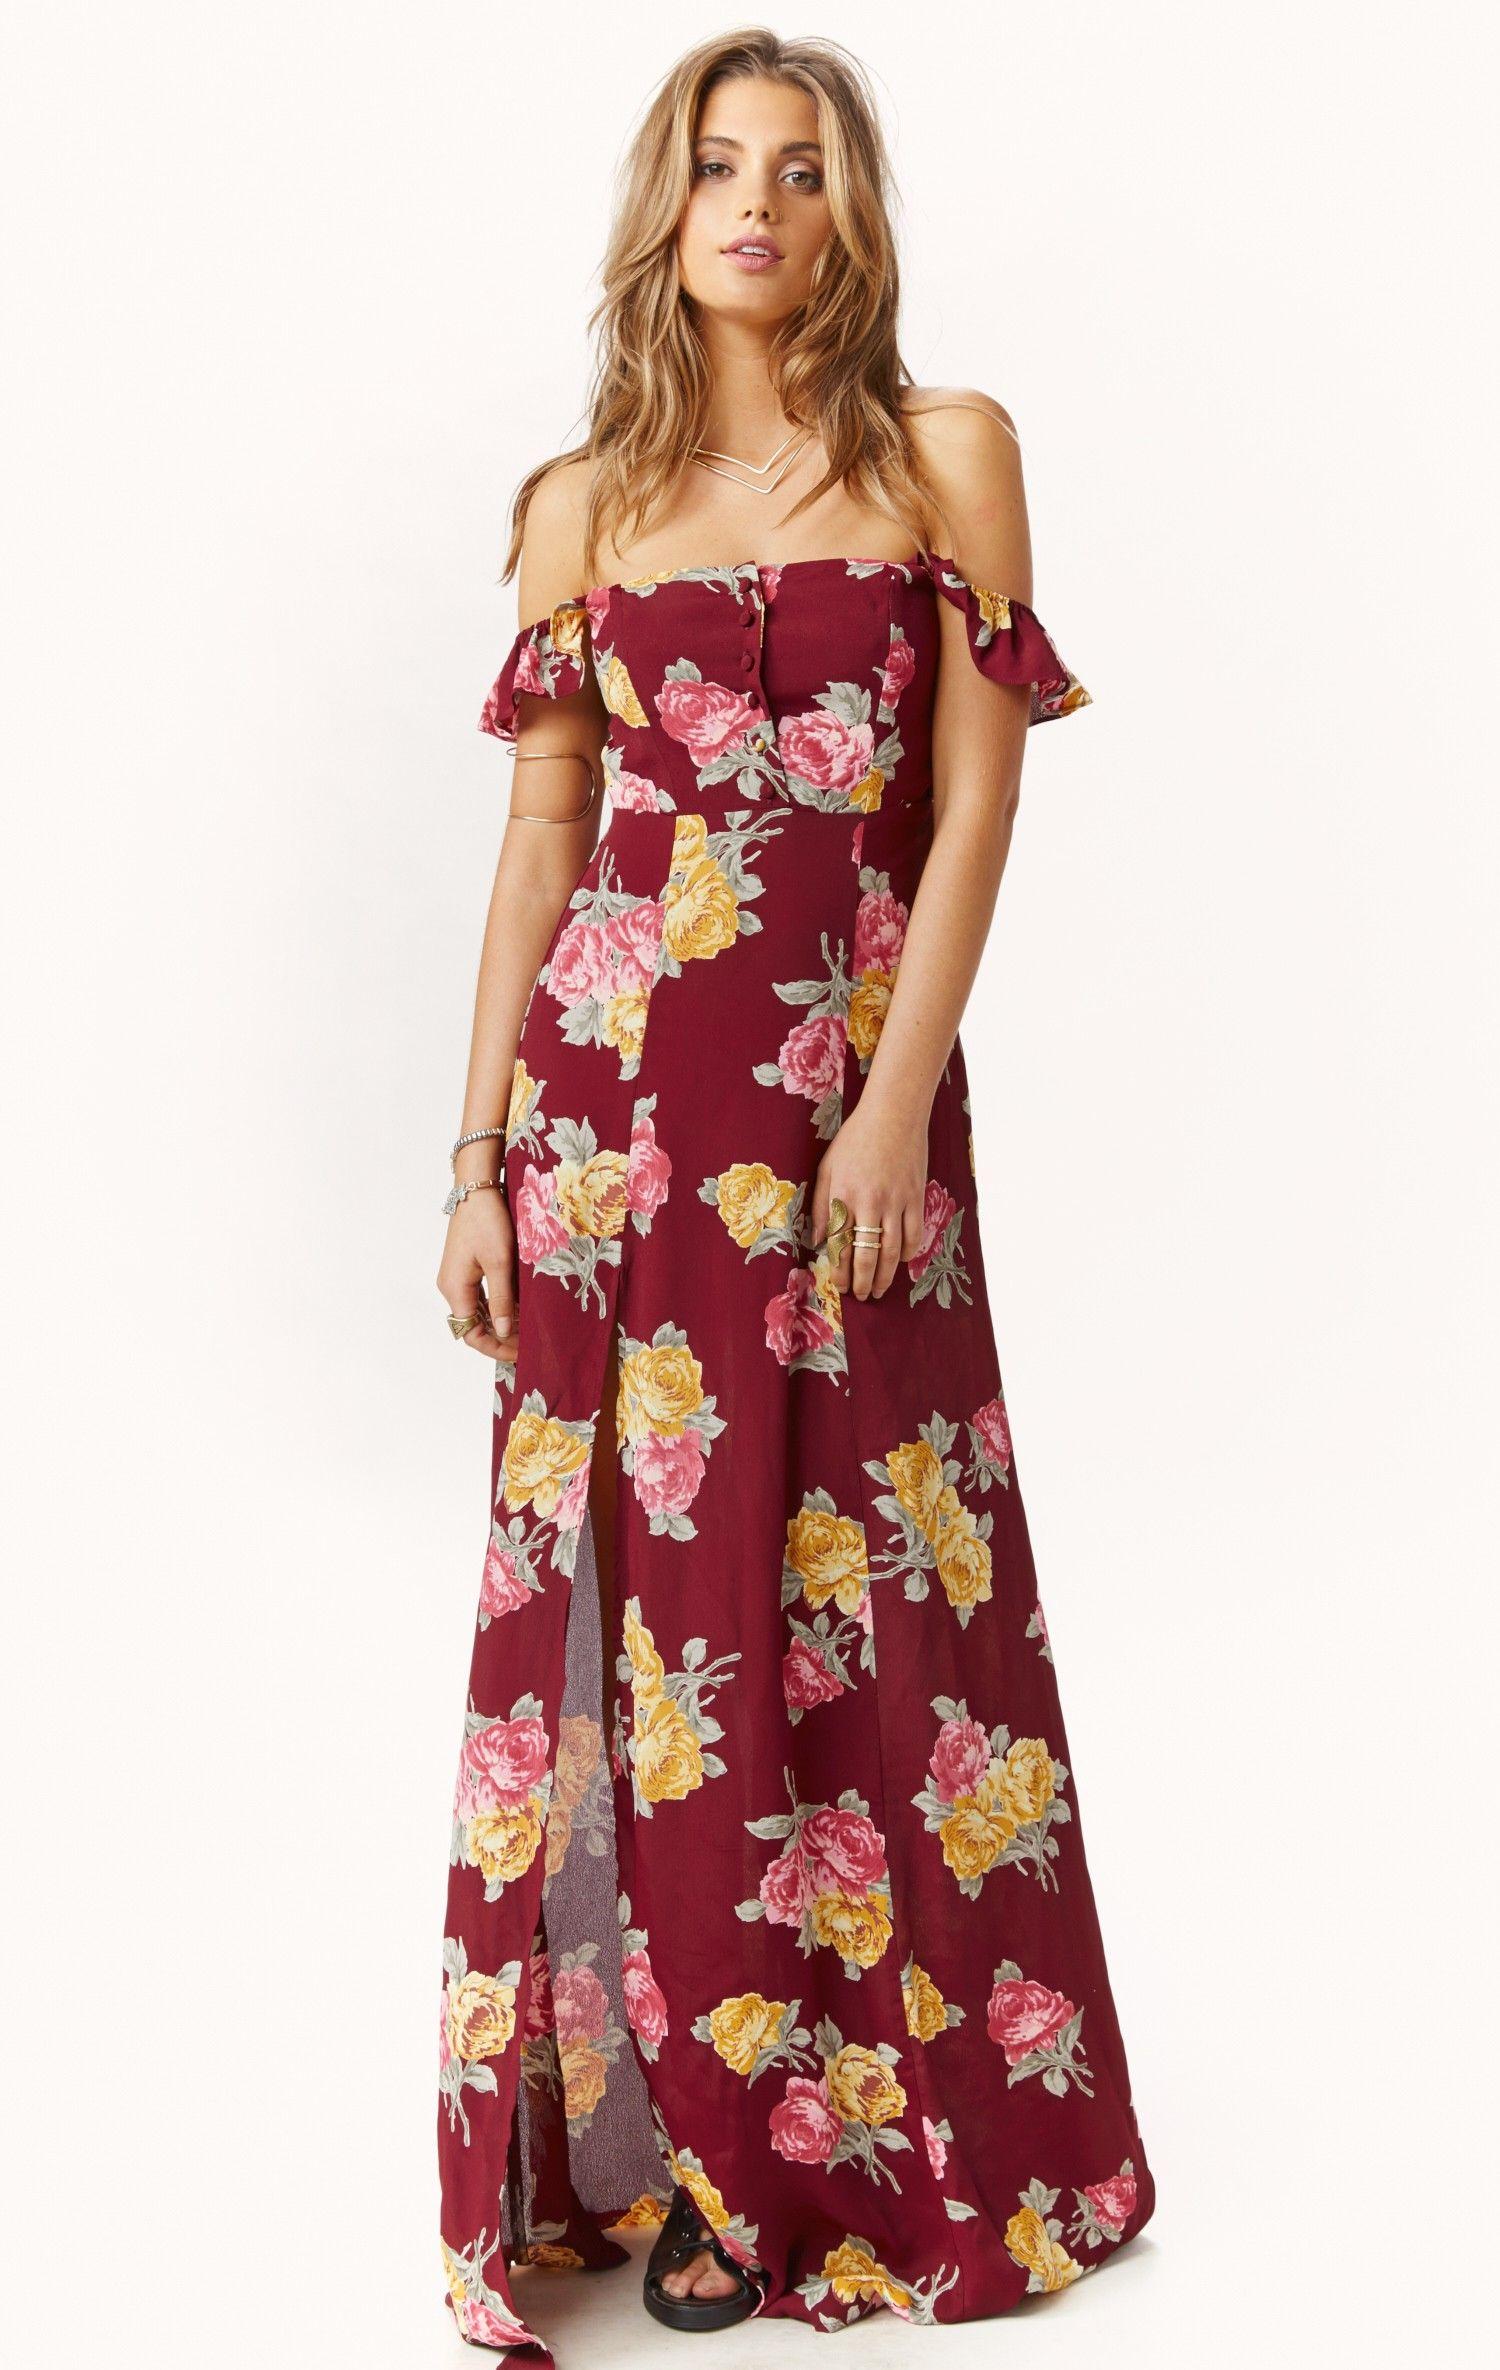 e778d2bfecd2 Bardot maxi dress